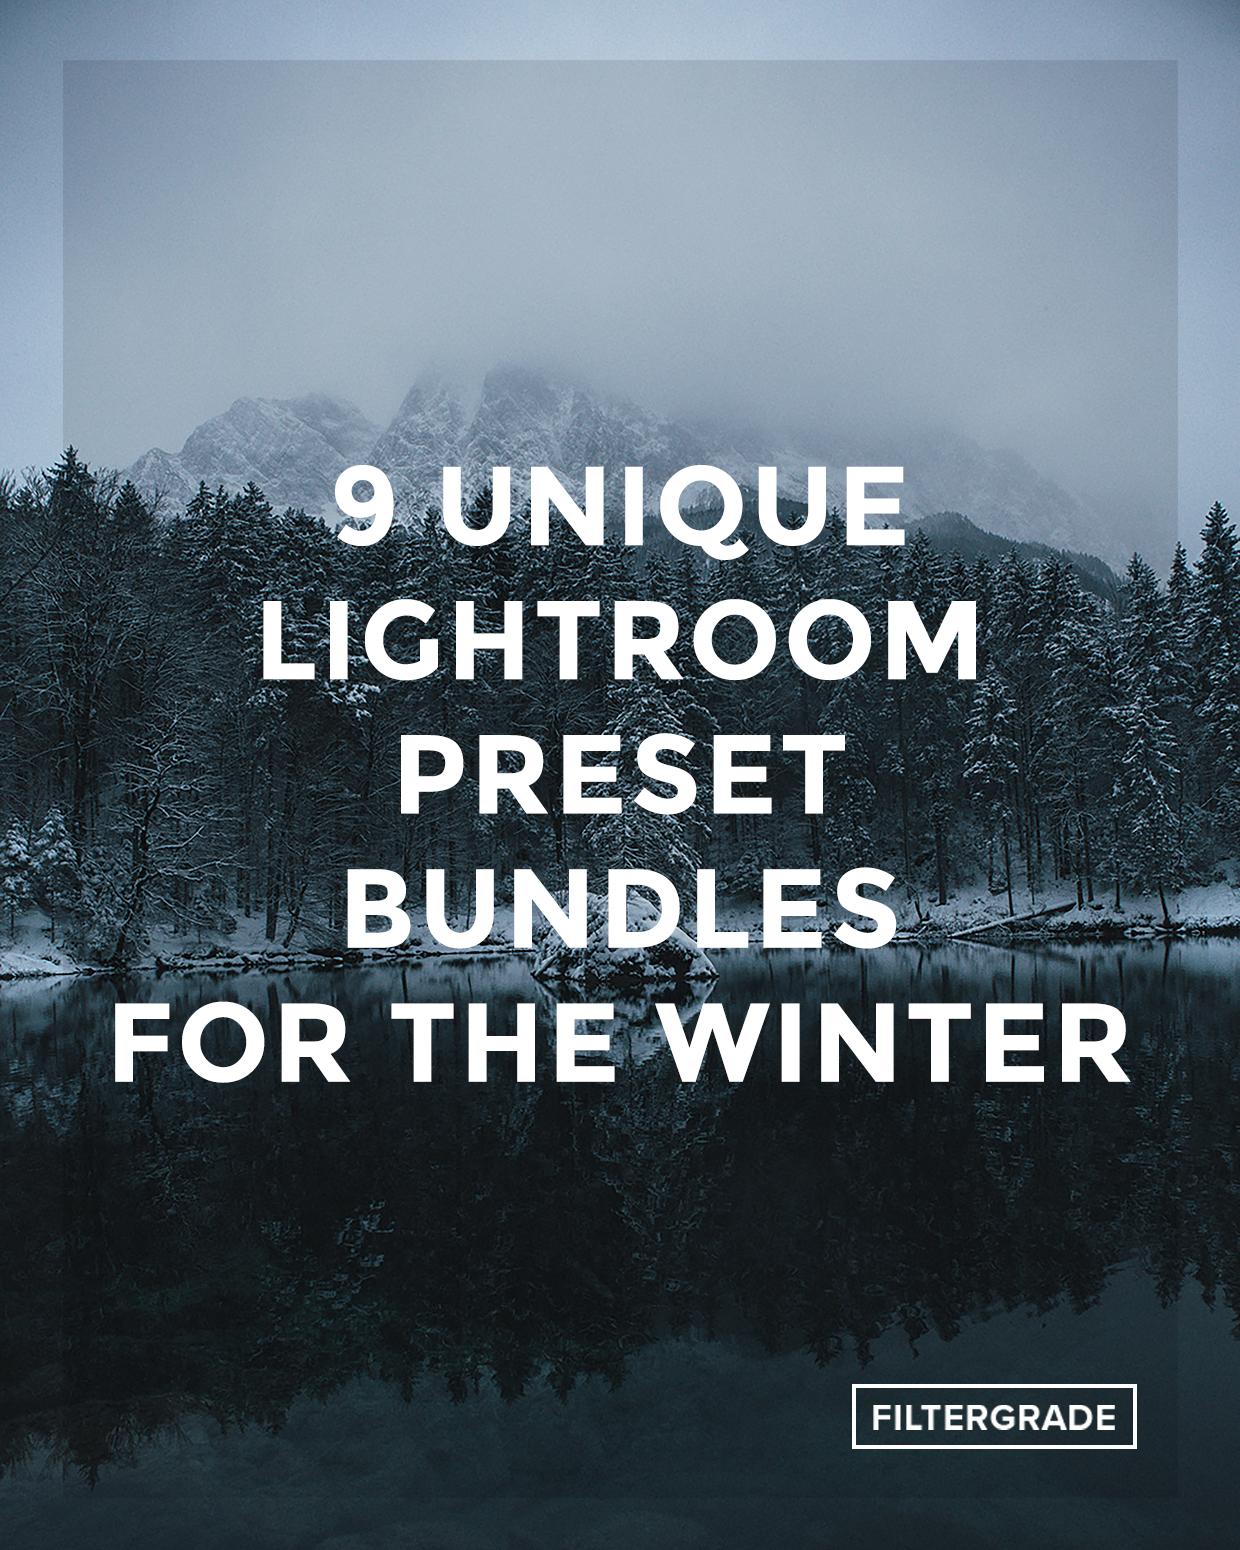 *Featured - 9 Unique Lightroom Preset Bundles for the Winter - FilterGrade